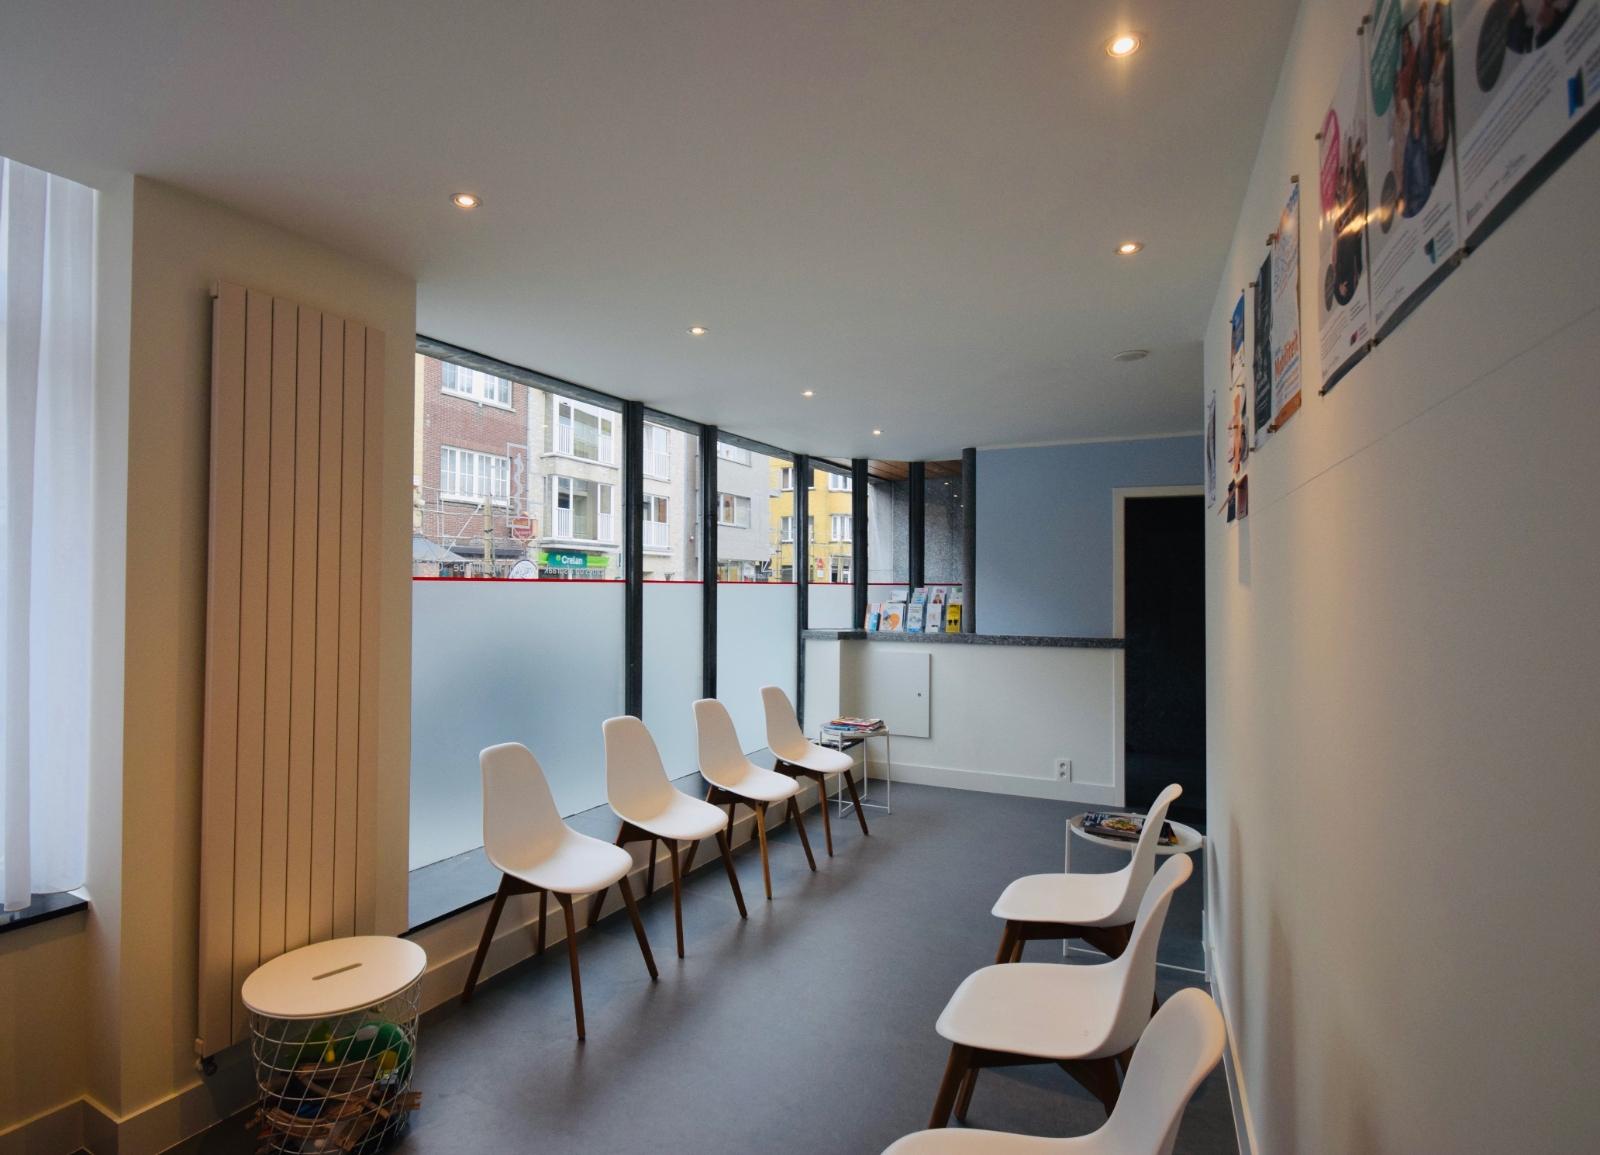 Praktijk- of kantoorruimte te huur in het centrum van Diksmuide. - 4